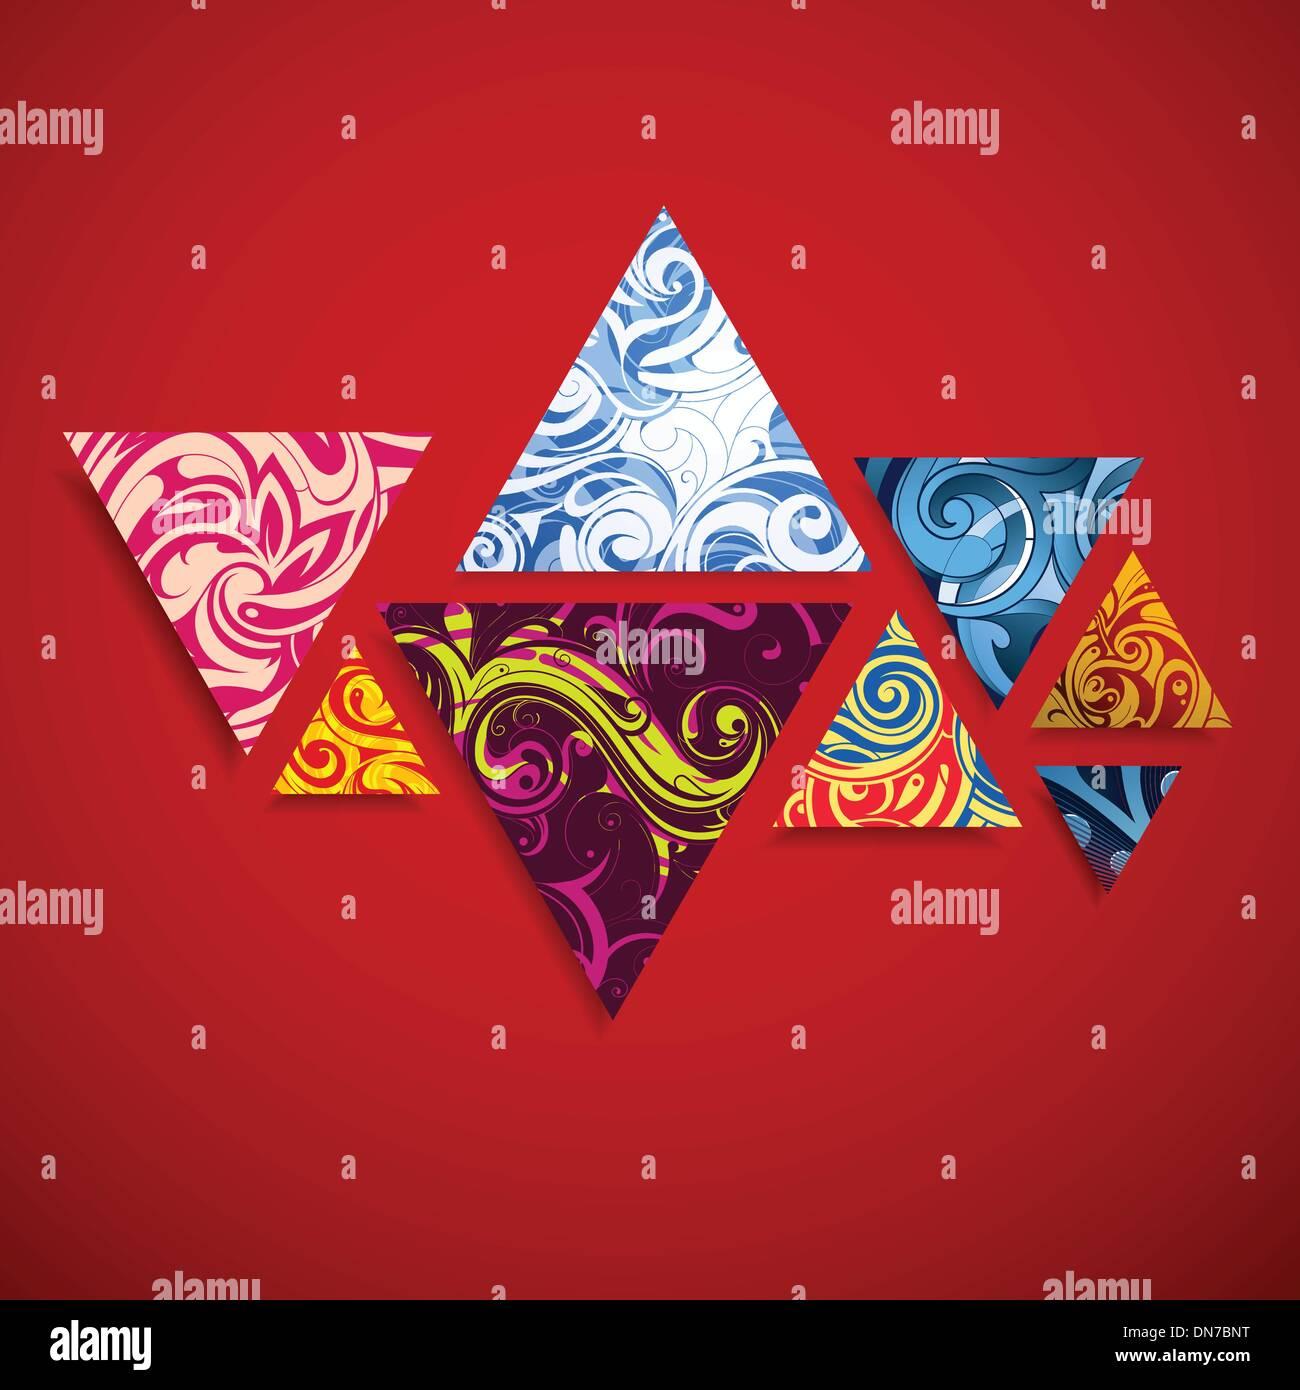 Graphic design - Stock Image